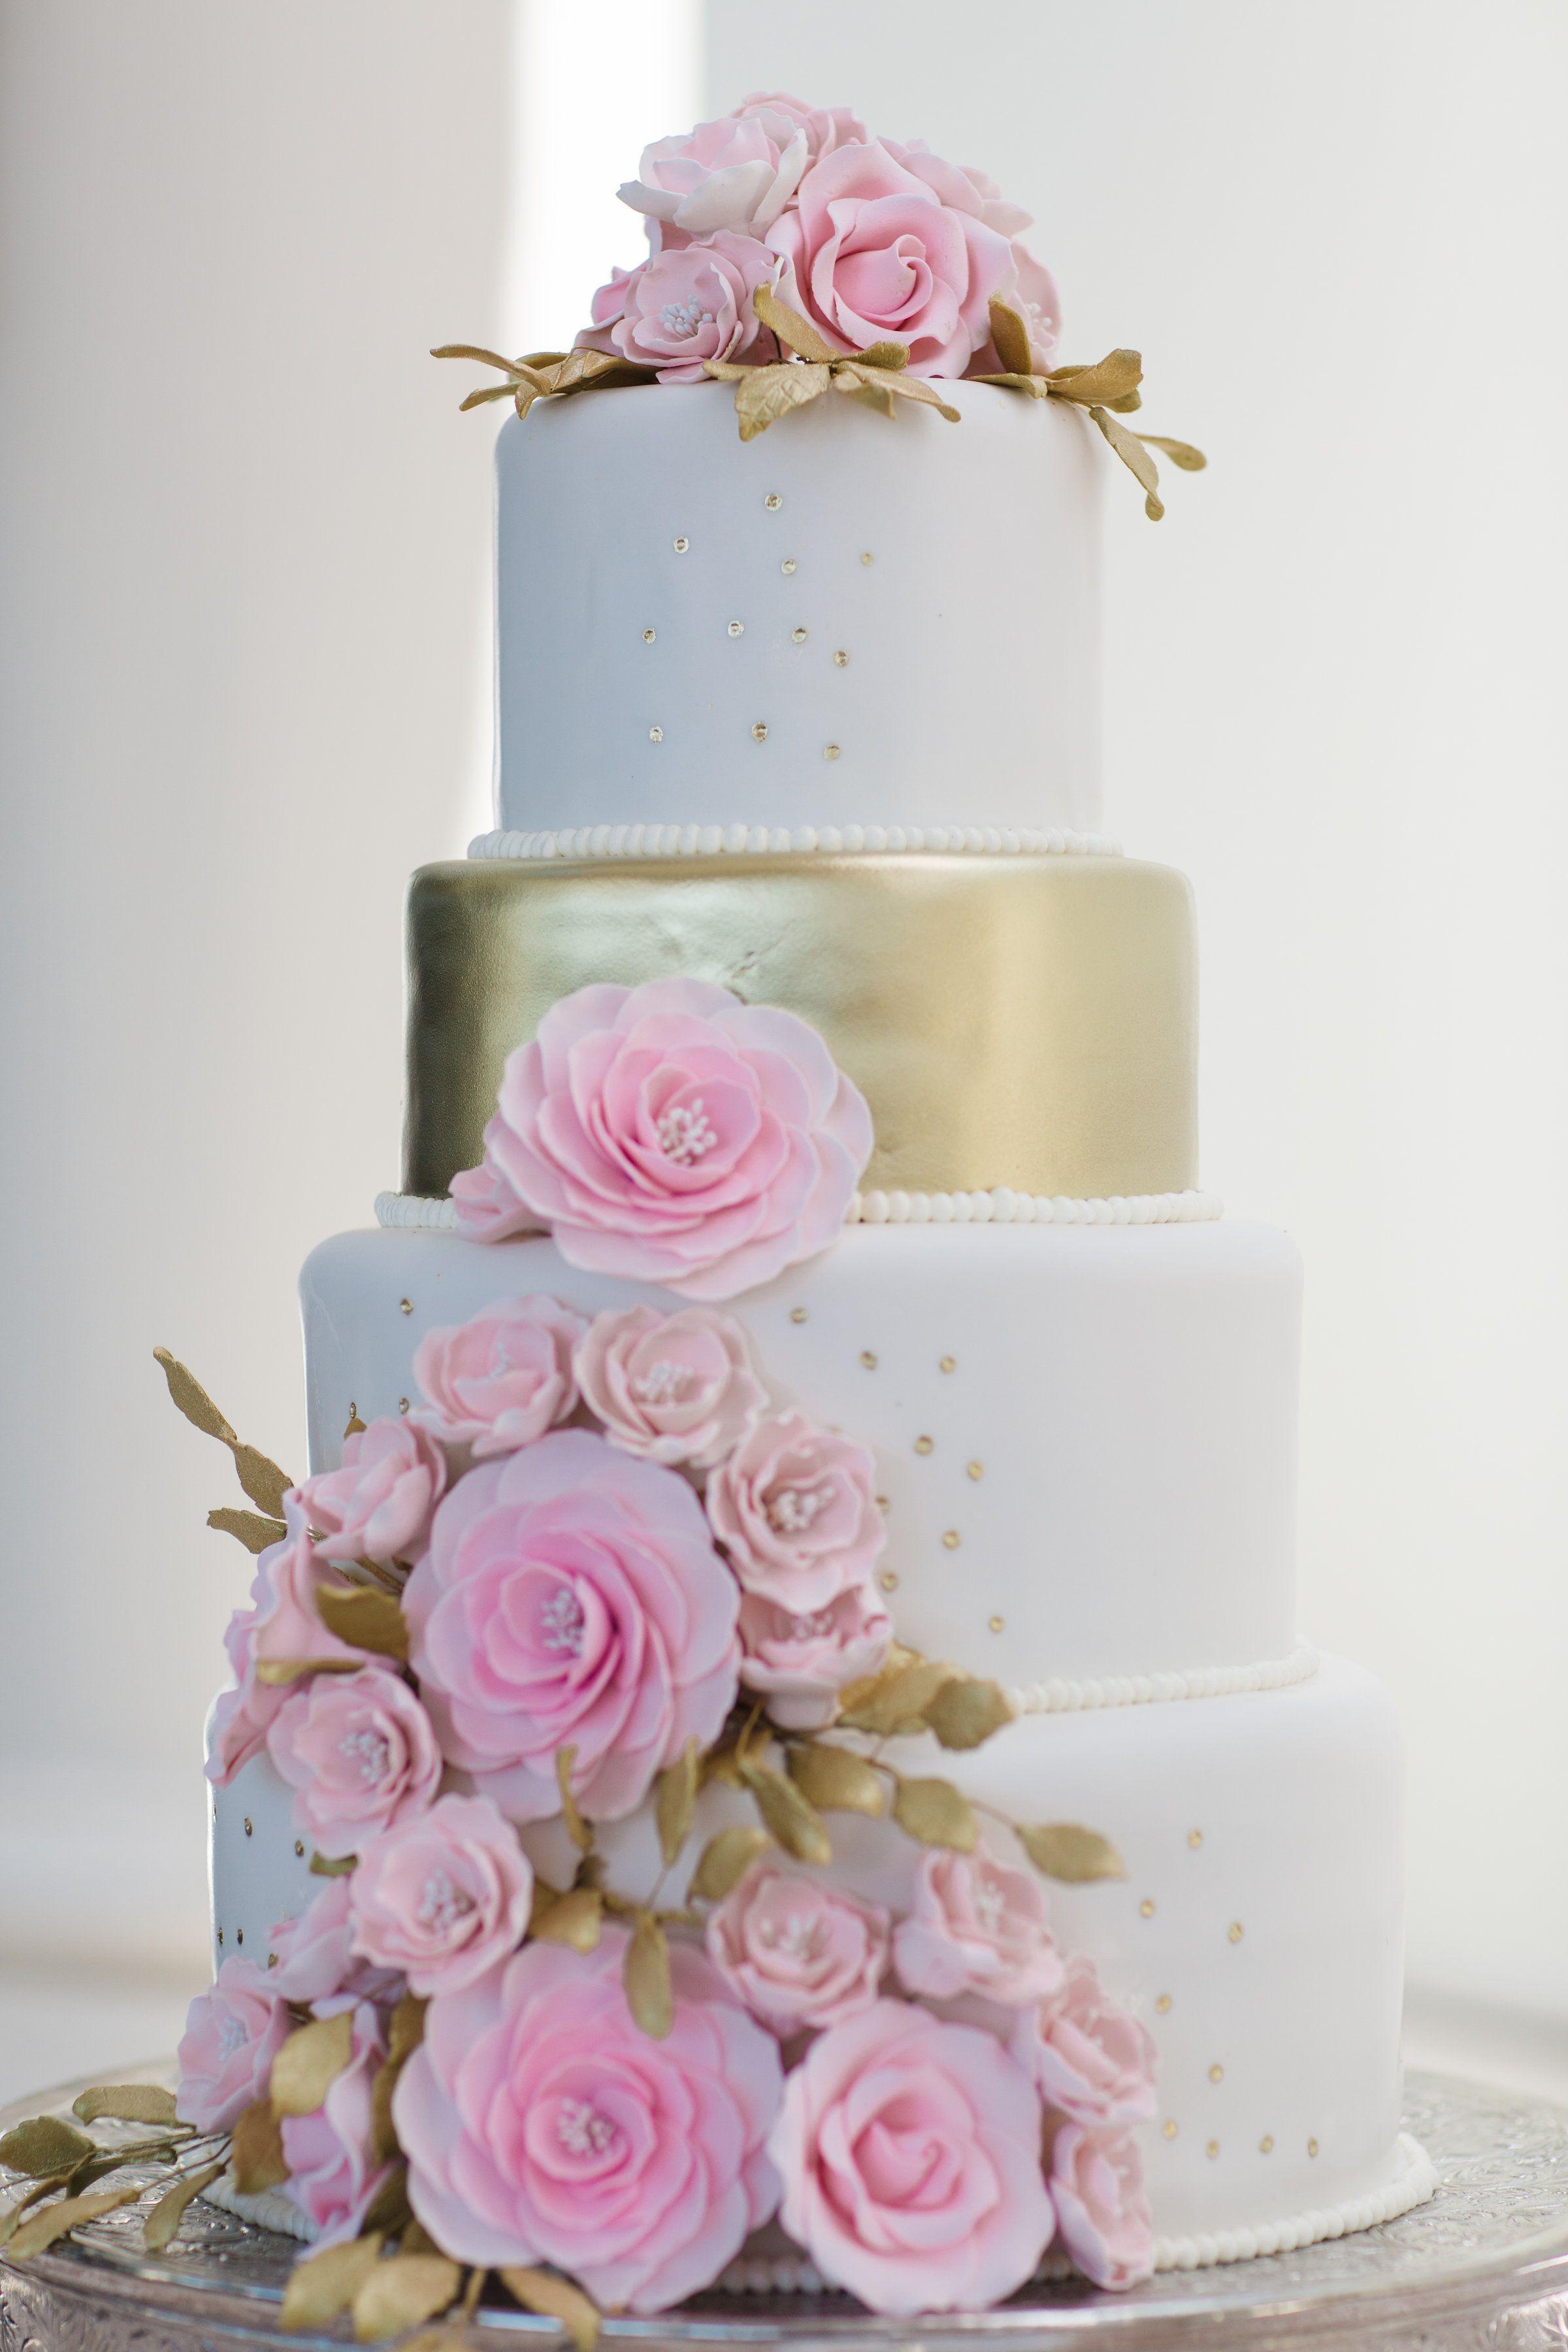 Monarch Beach Resort, Blush Palate, Bride, Groom, Wedding ...